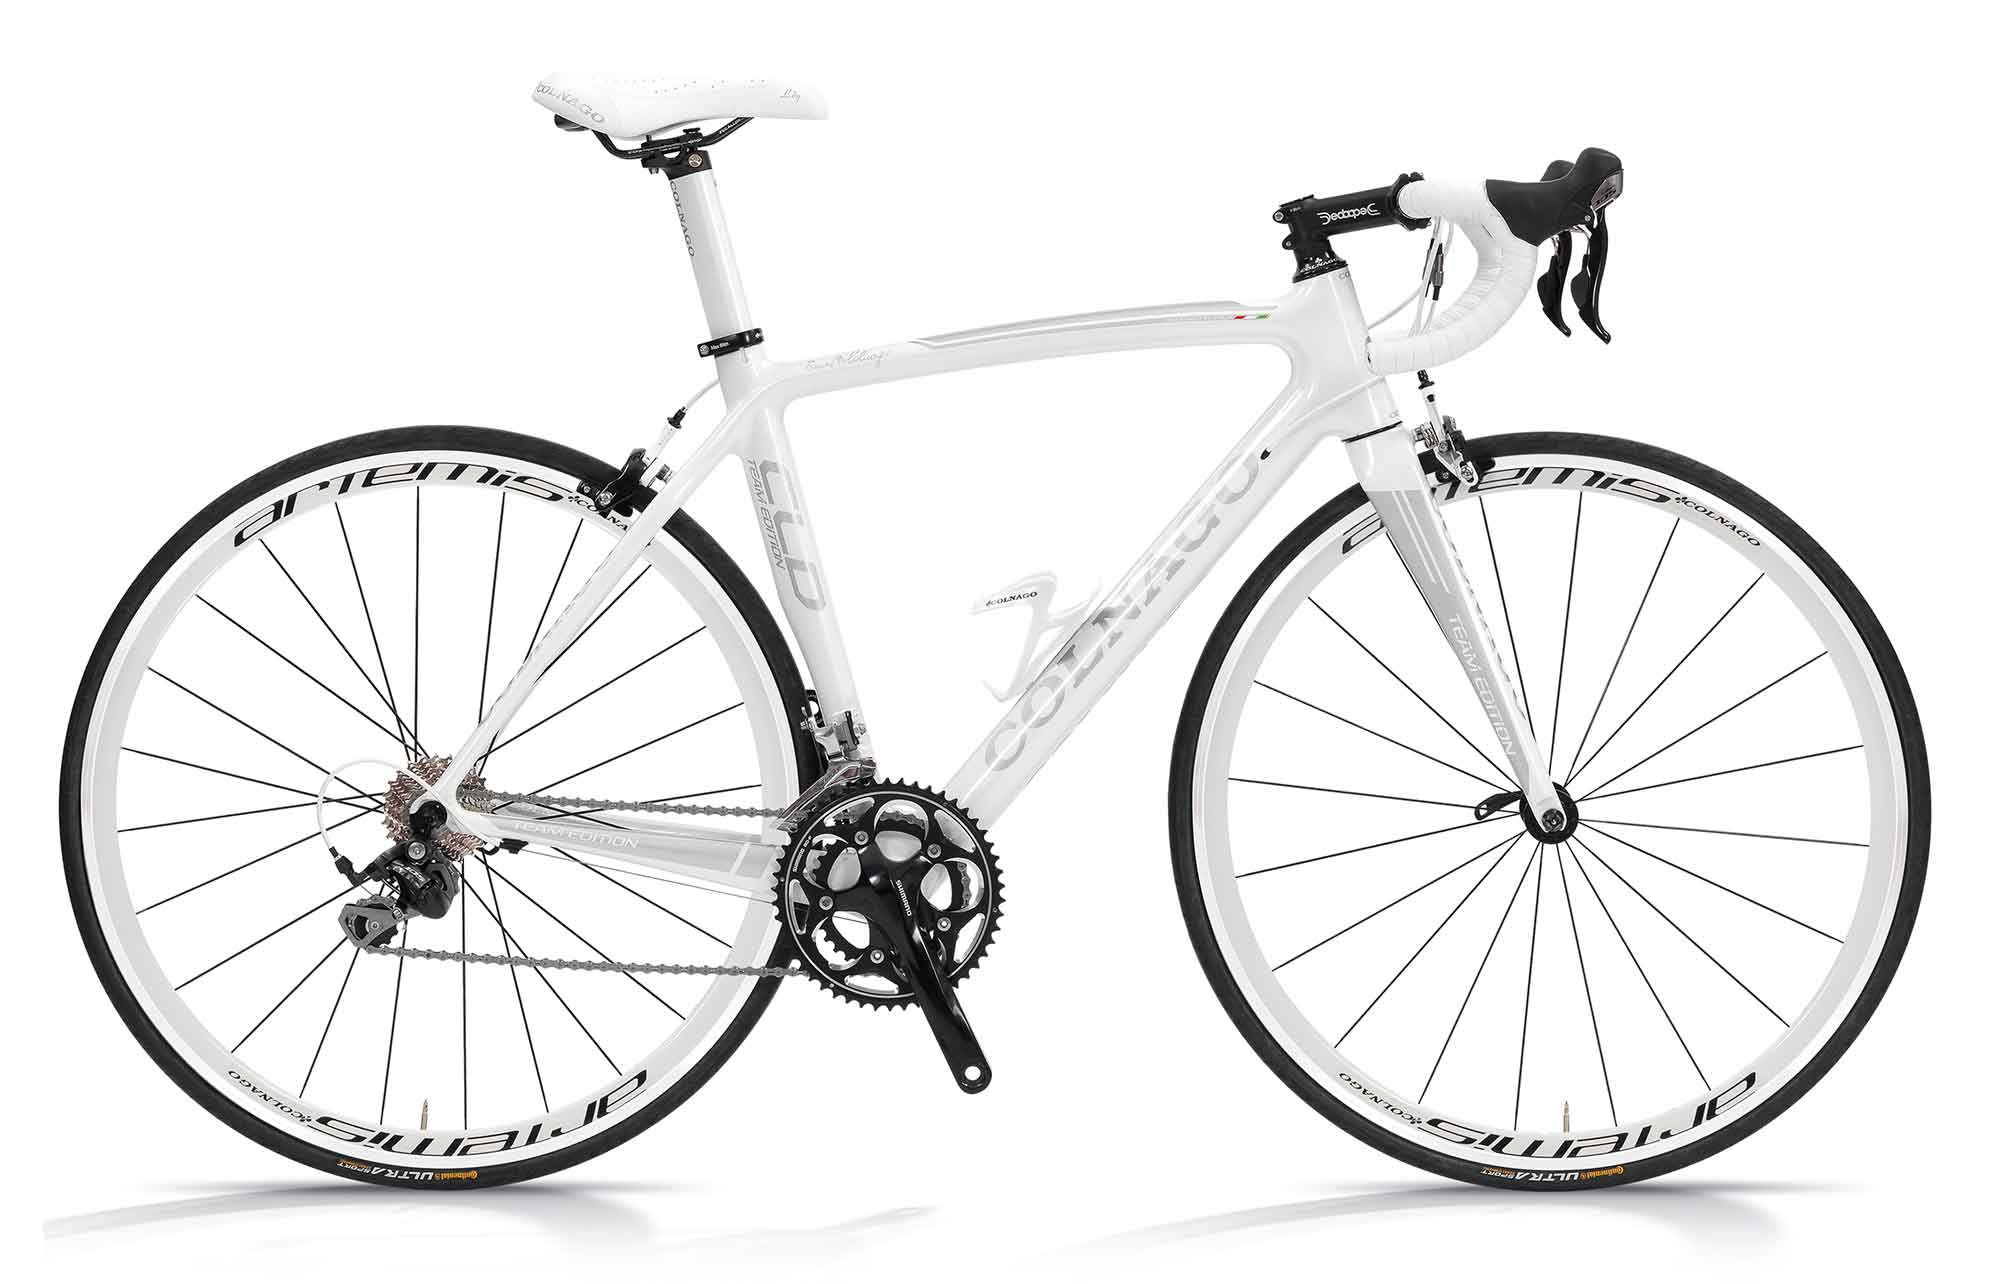 a896bf89fc7 2015 Colnago CLD Ultegra Bike | R&A Cycles